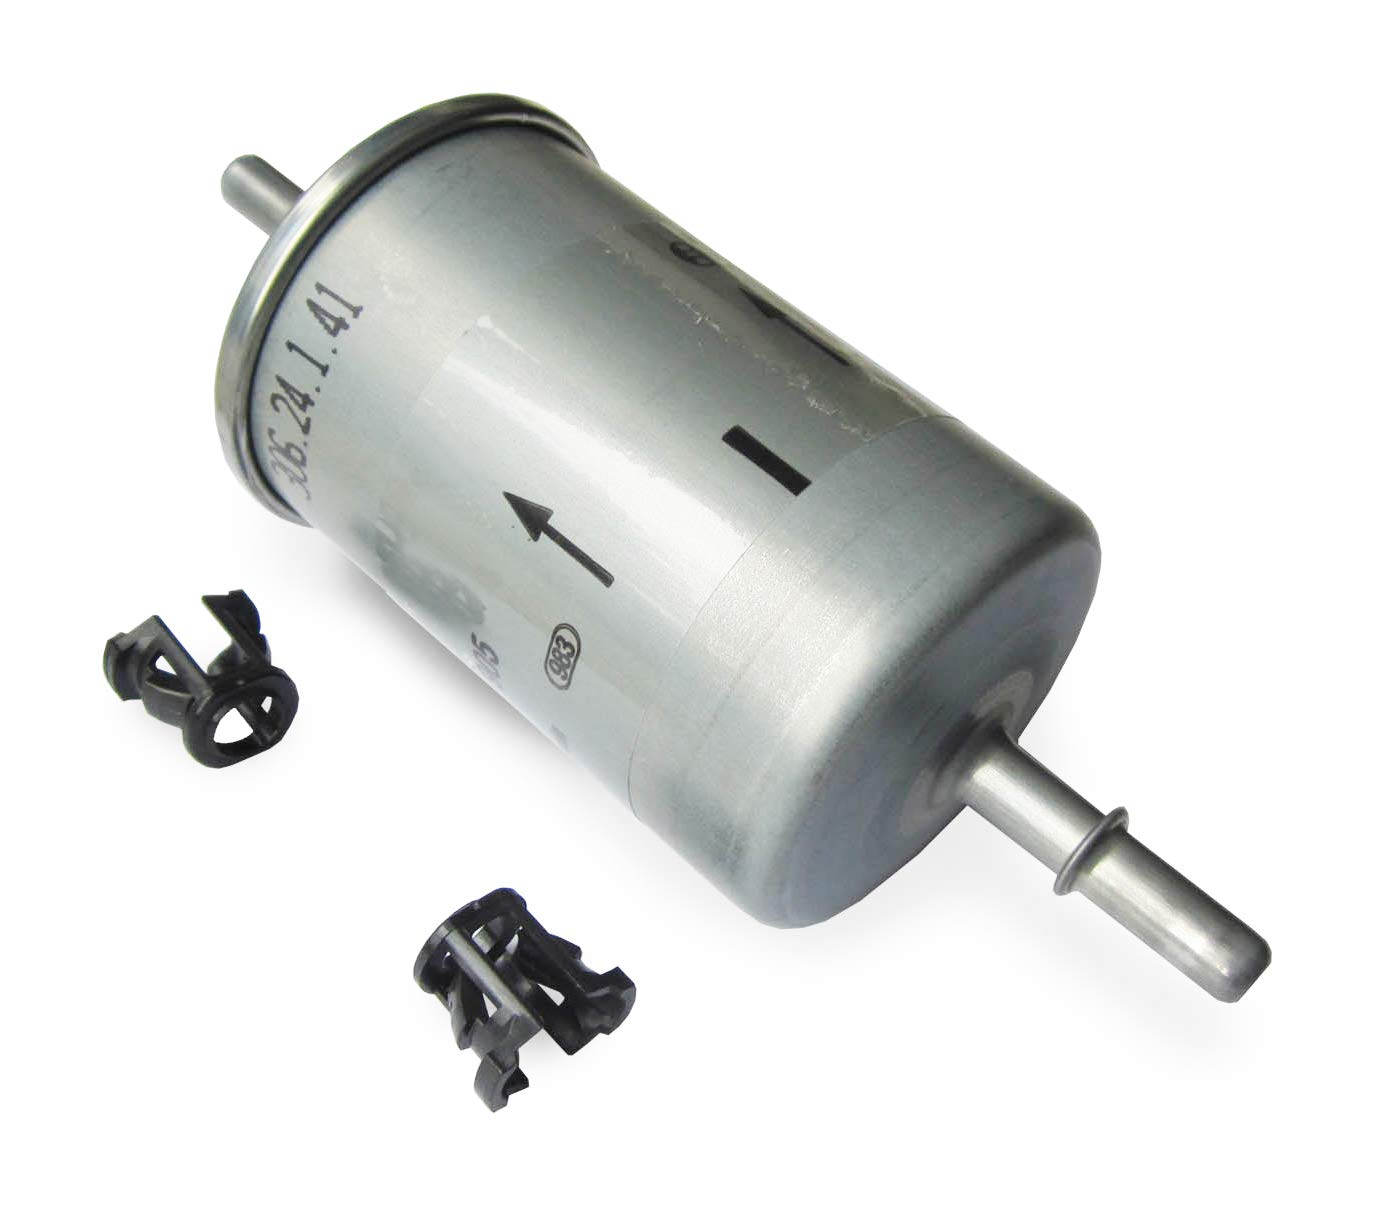 Amazon.com: HFP-F110 Polaris Ranger 500 / Sportsman 500 /Sportsman 700 /  Sportsman 800 2004-2014 ATV/UTV Fuel Filter with Clips: Automotive